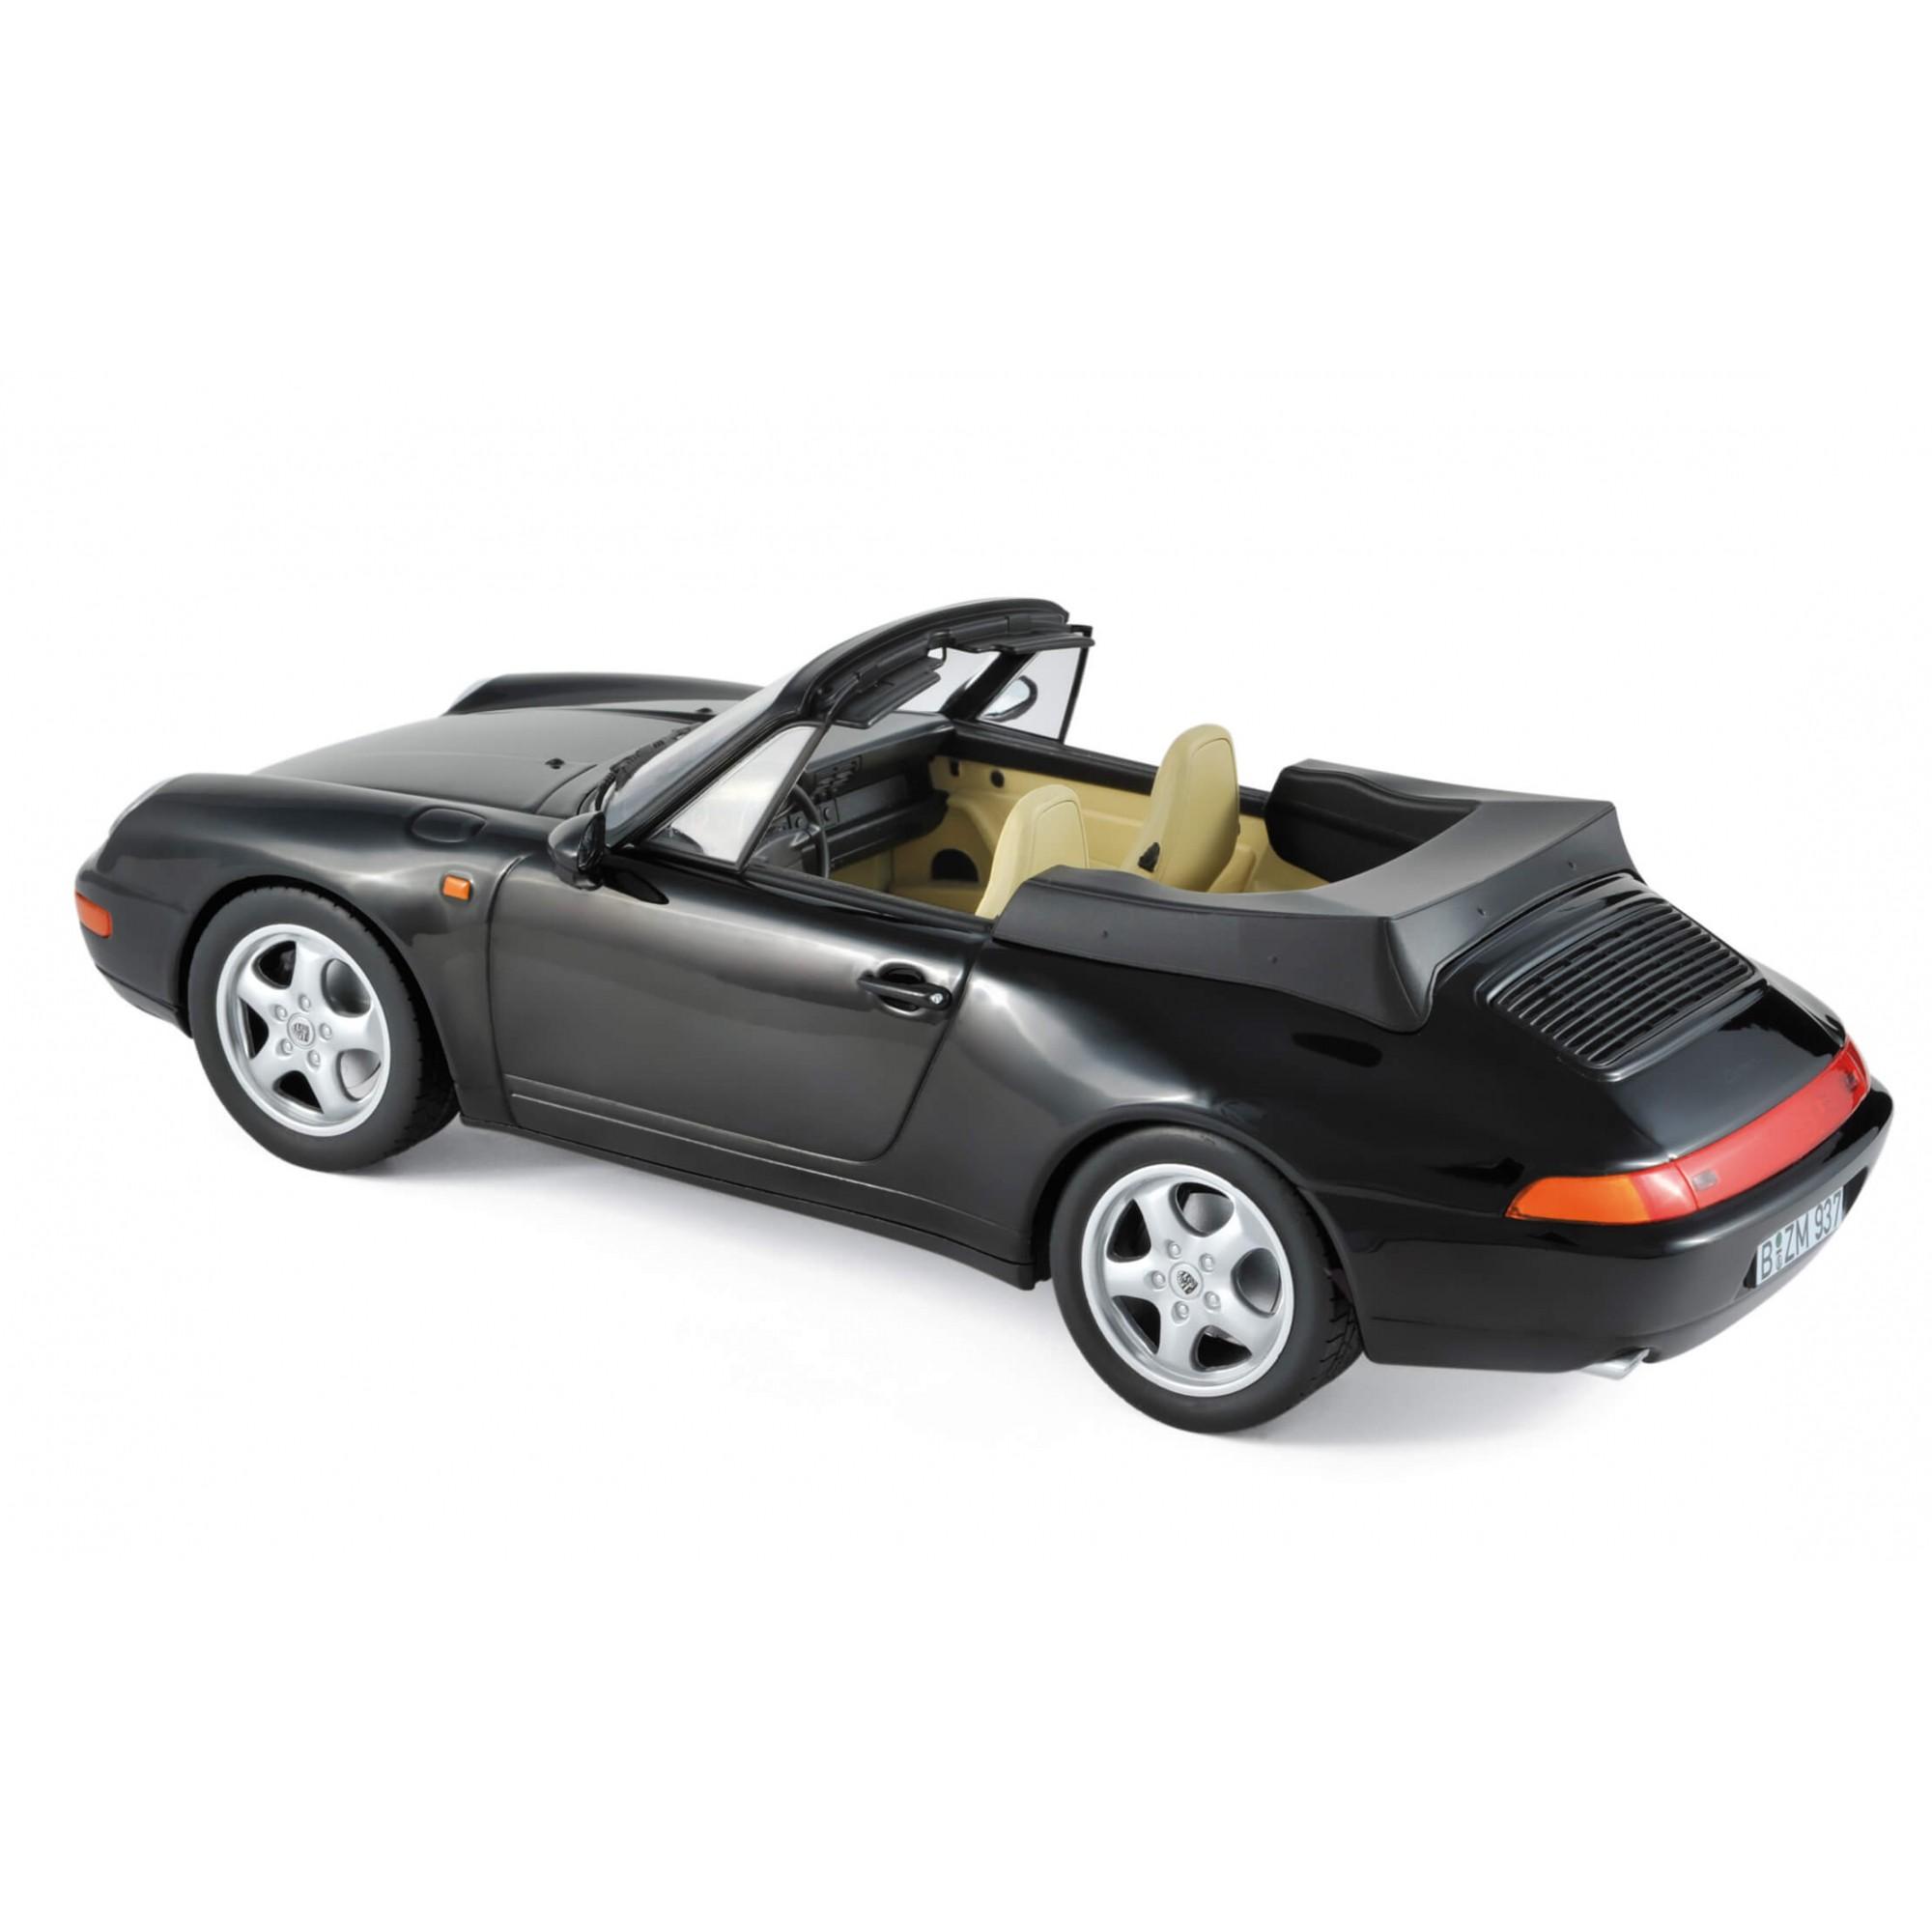 Miniatura Porsche Carrera Gabriolet 1993 1/18 Norev